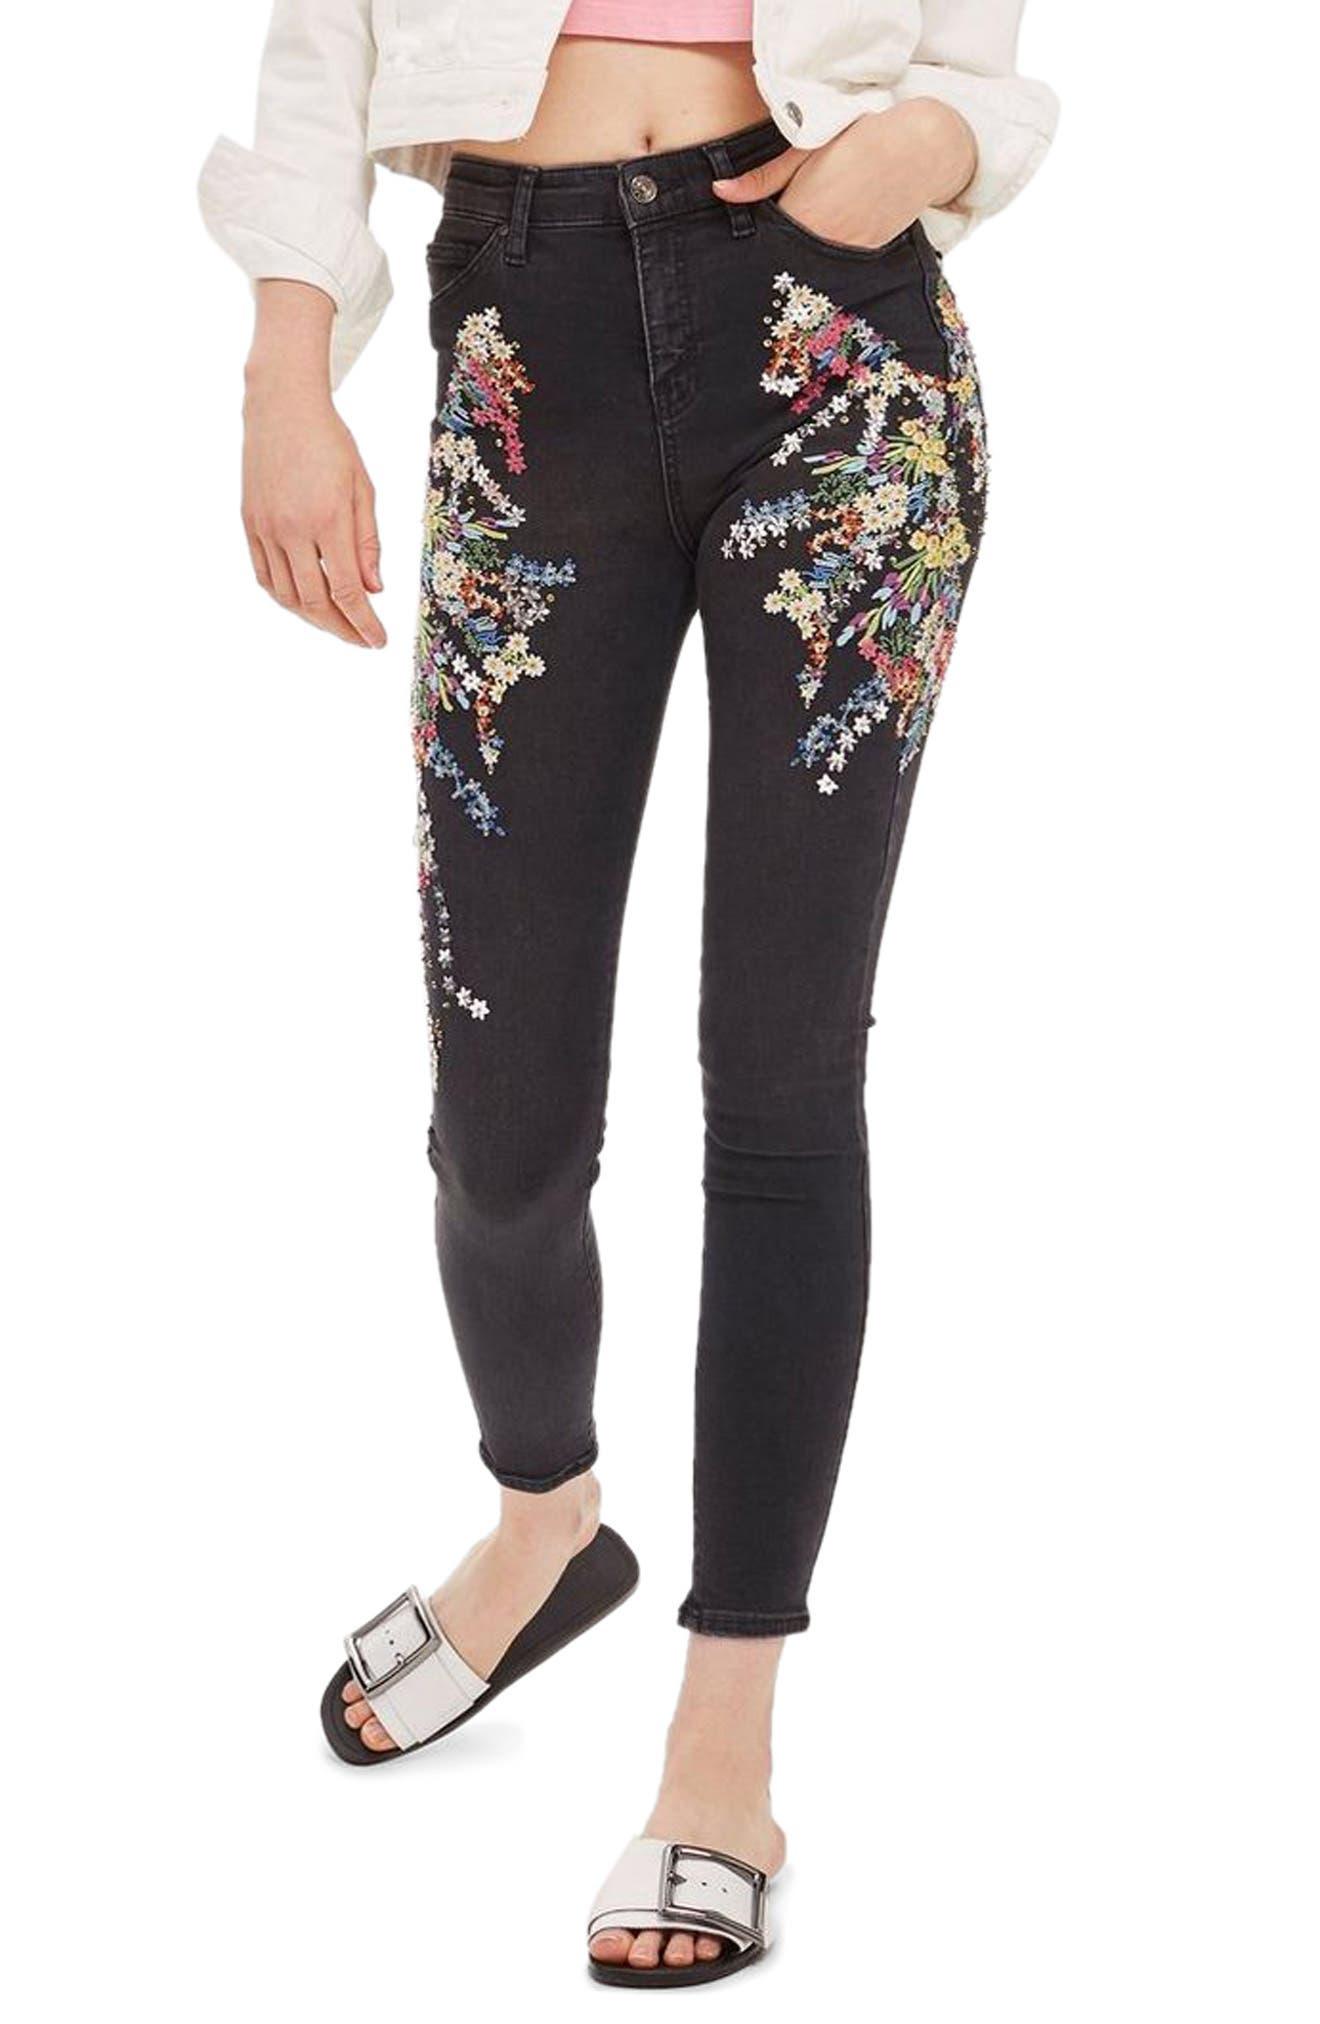 MOTO Jamie Ditsy Embellished Jeans,                             Main thumbnail 1, color,                             Black Multi